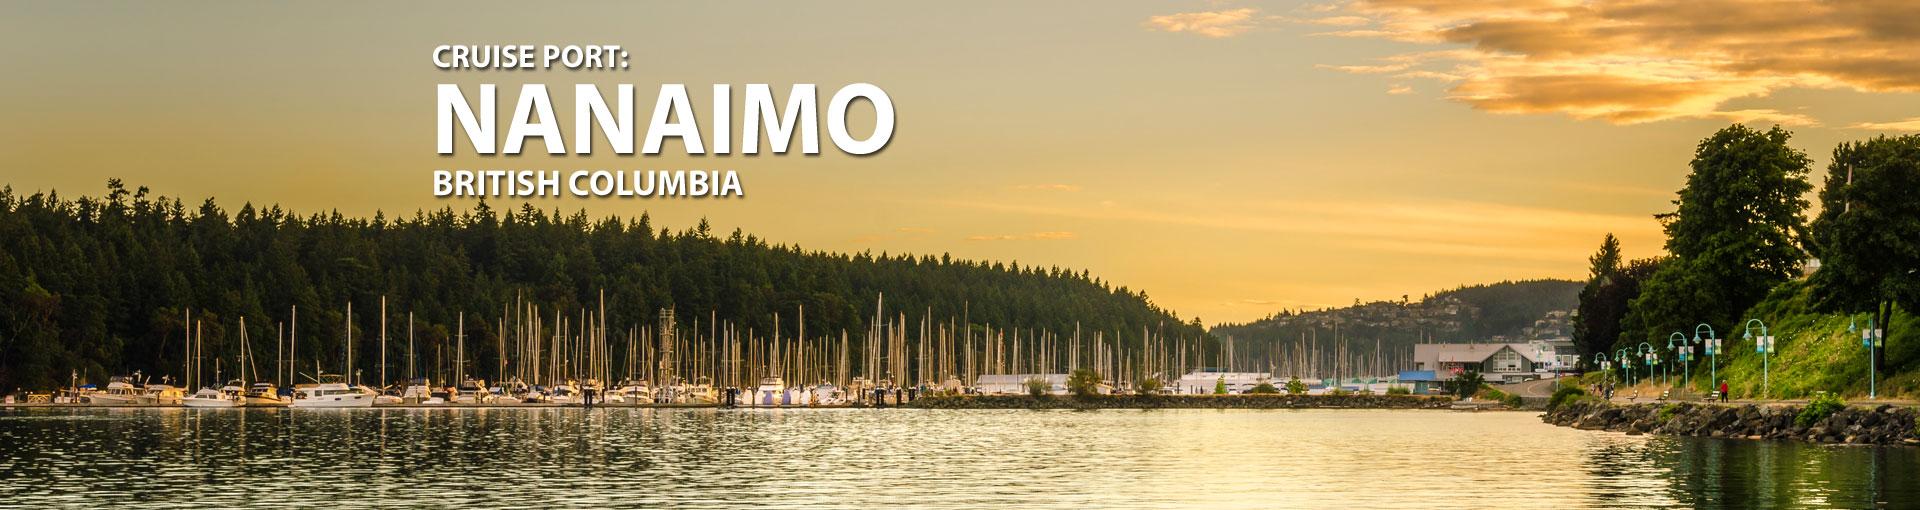 Cruises to Nanaimo British Columbia